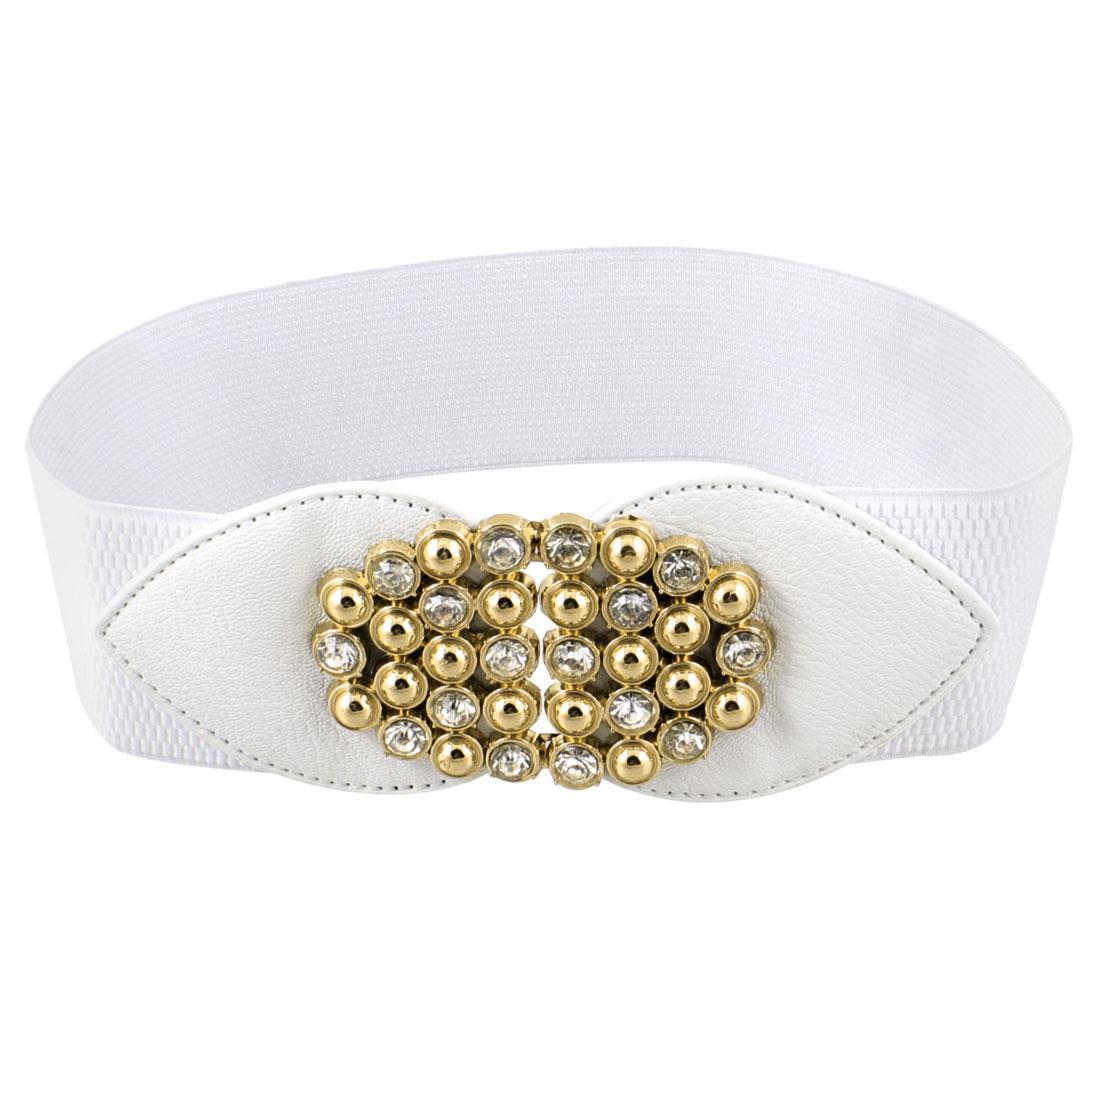 Faux Leather Plastic Rhinestone Decor Stretchy Waist Belt White for Women